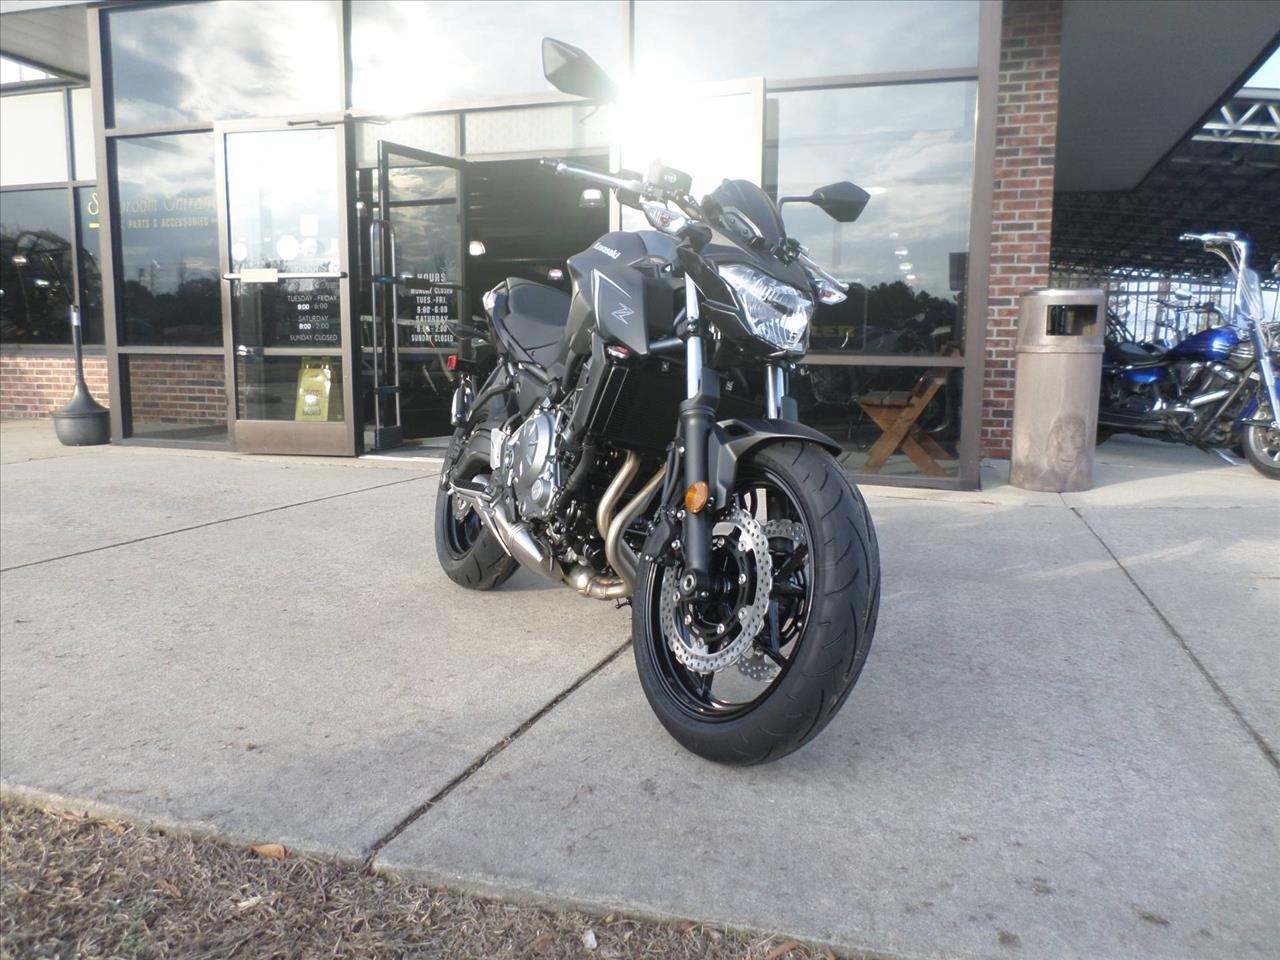 2017 Kawasaki Z650 for sale at Vehicle Network, LLC - Ron Ayers Motorsports in Greenville NC